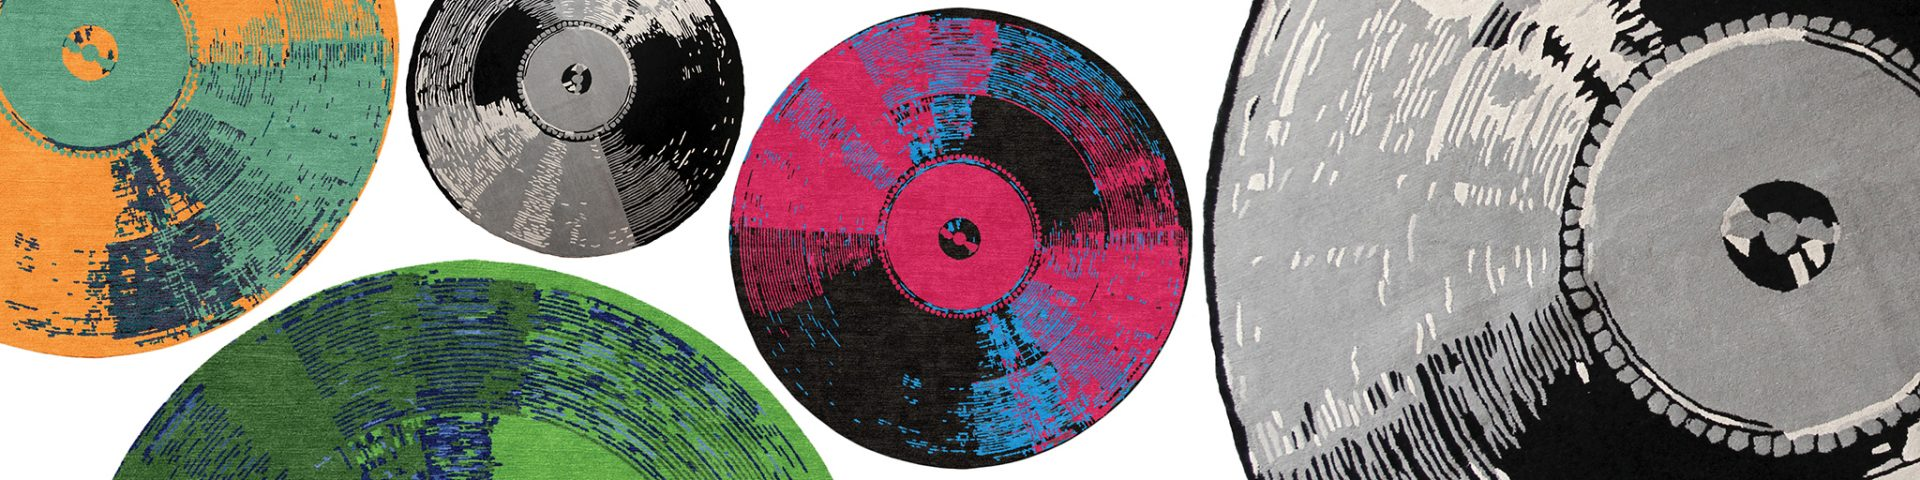 Warholian Kush | Vinyl - A renaissance. The Ruggist.